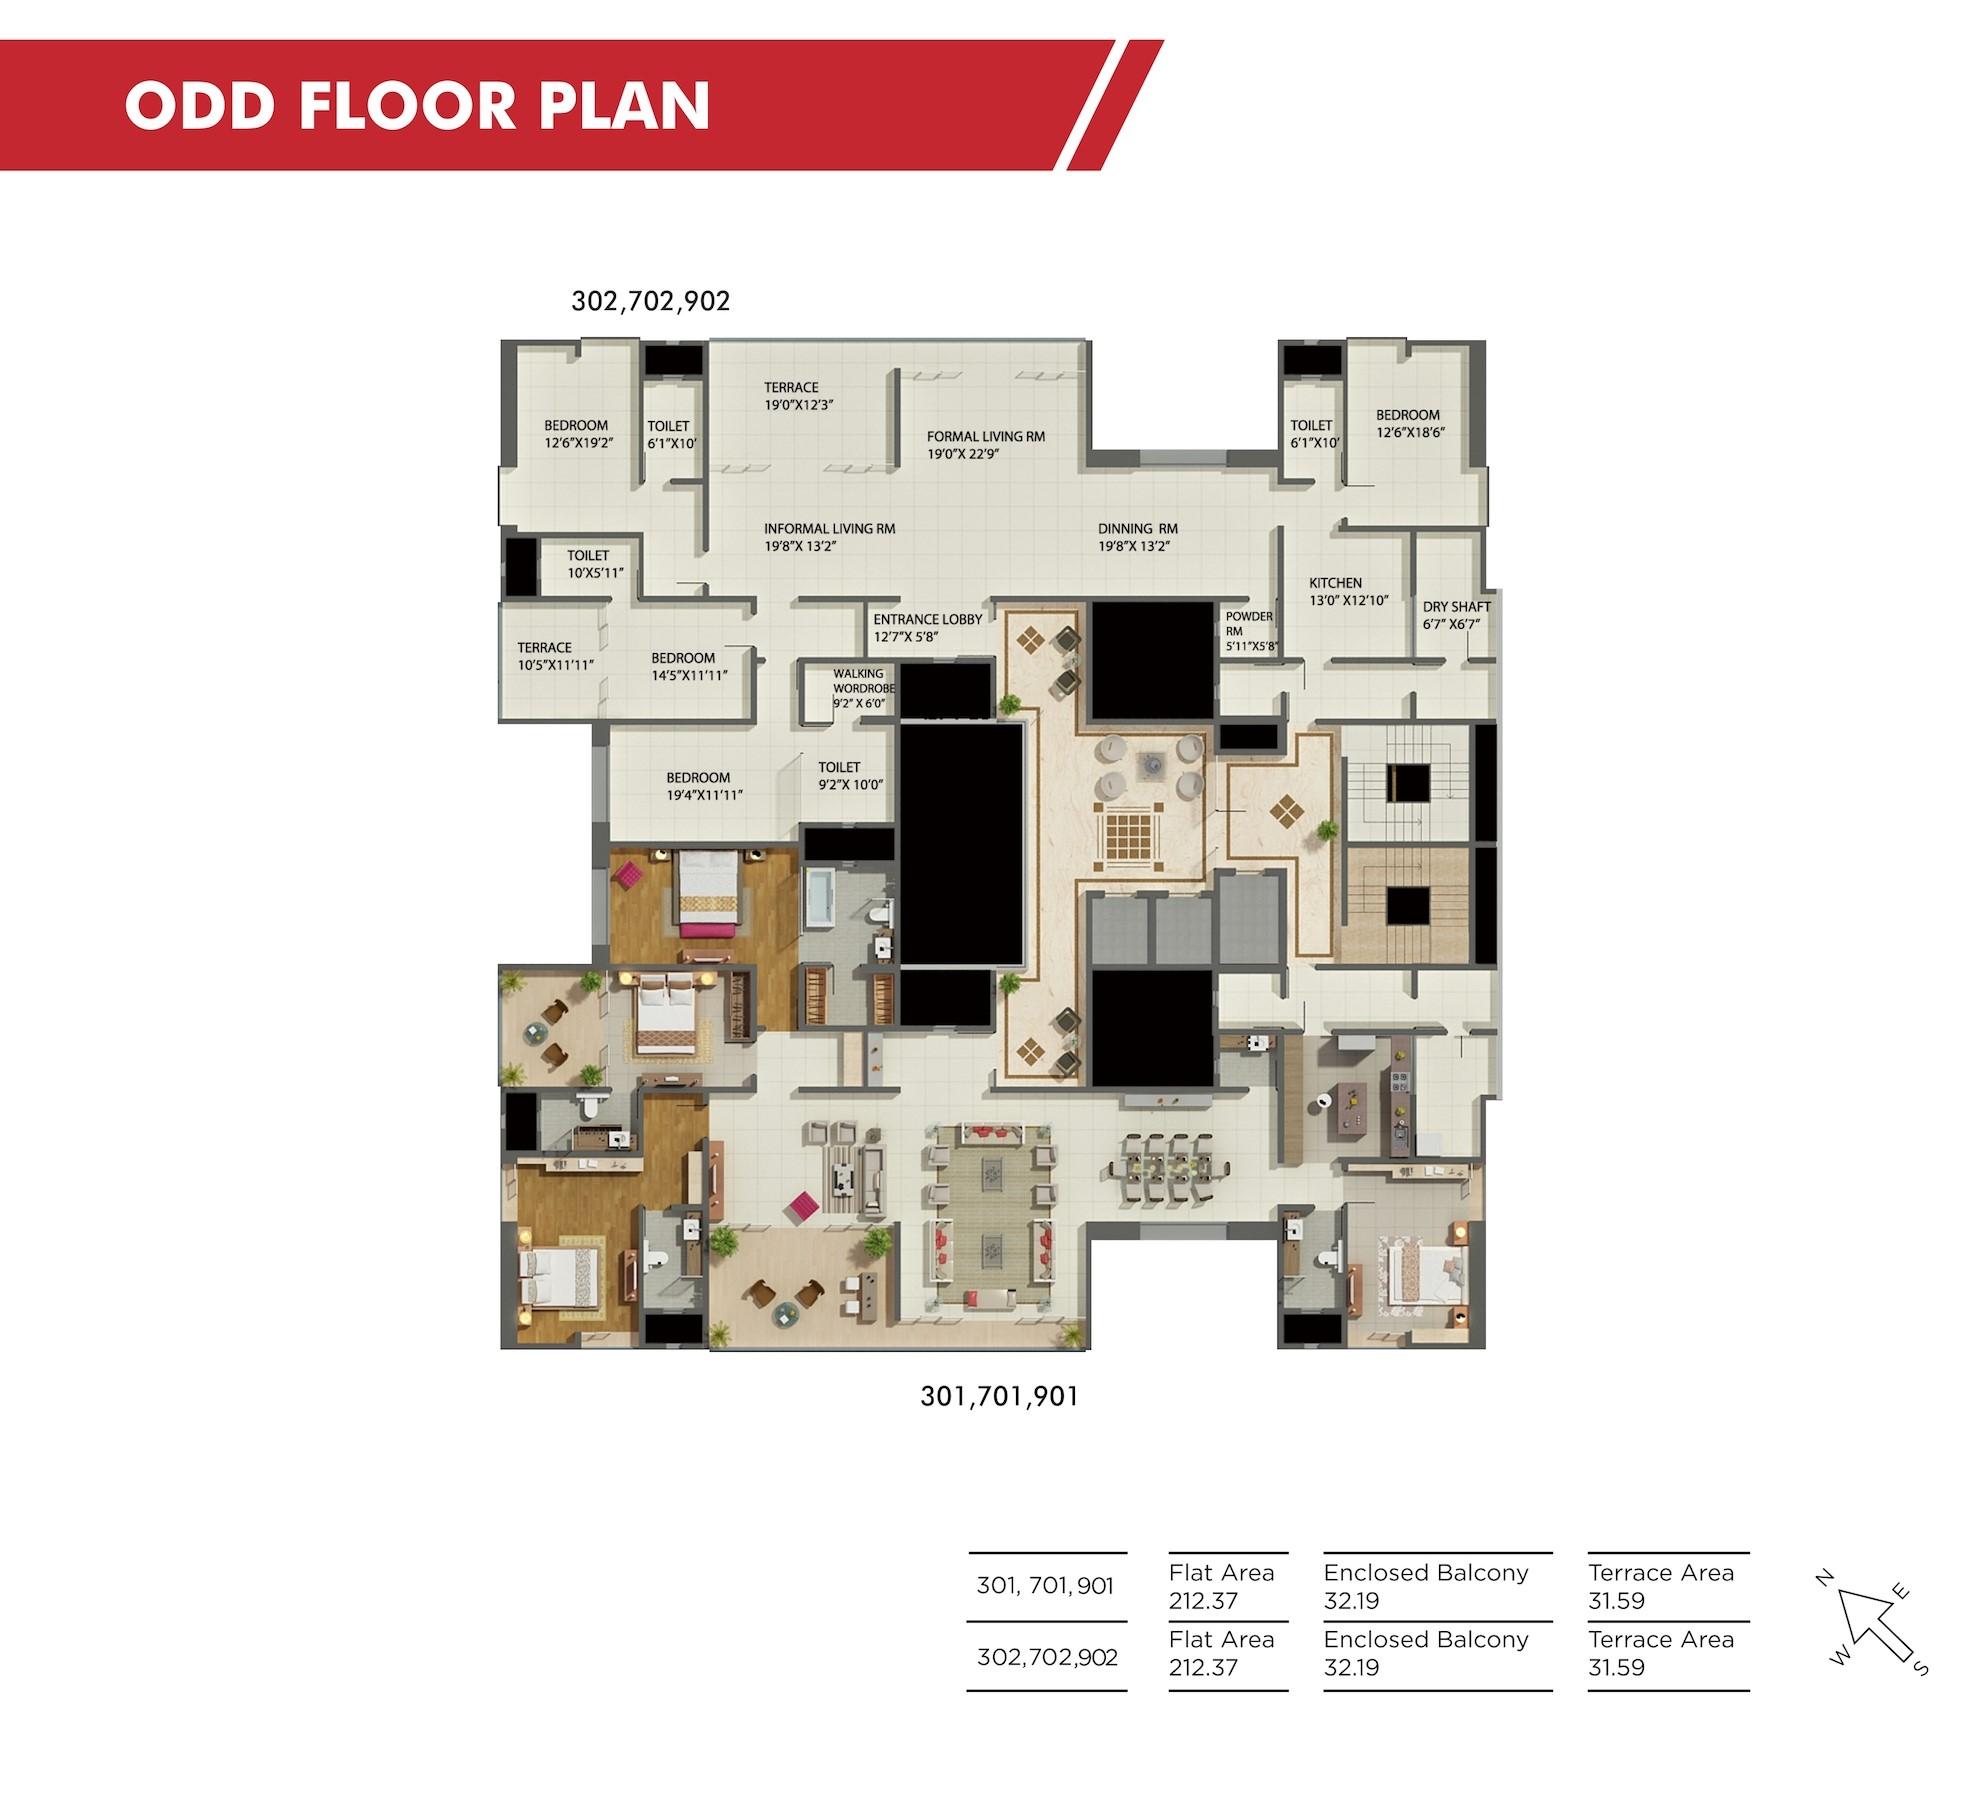 Shiloh Odd Floor Plan